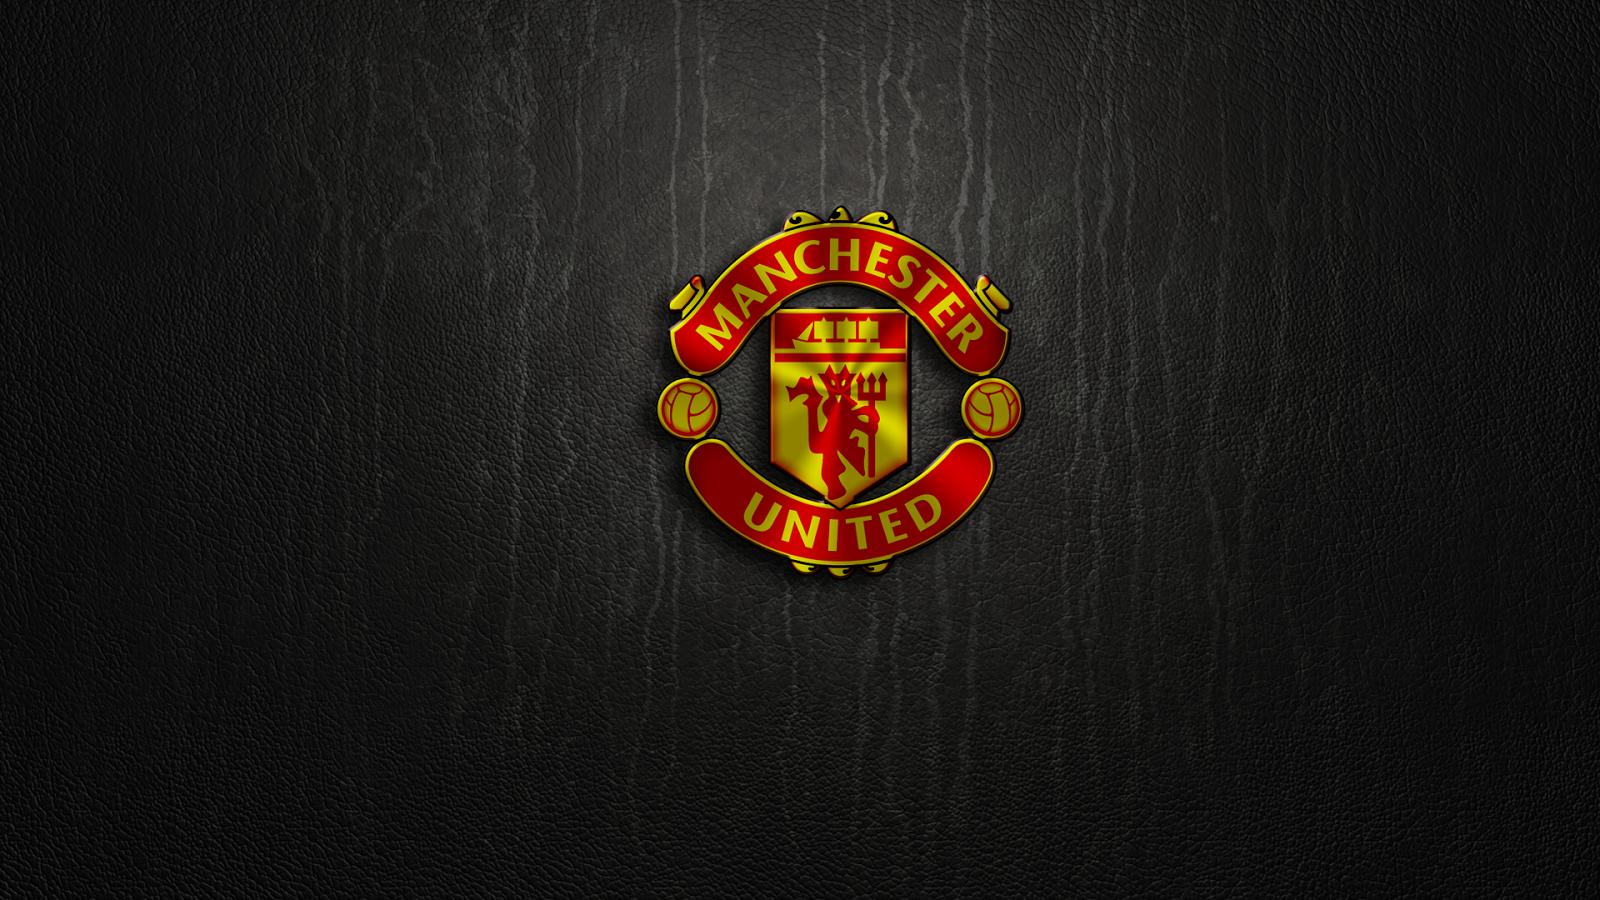 Manchester United Football Club Wallpaper Football Wallpaper HD 1600x900